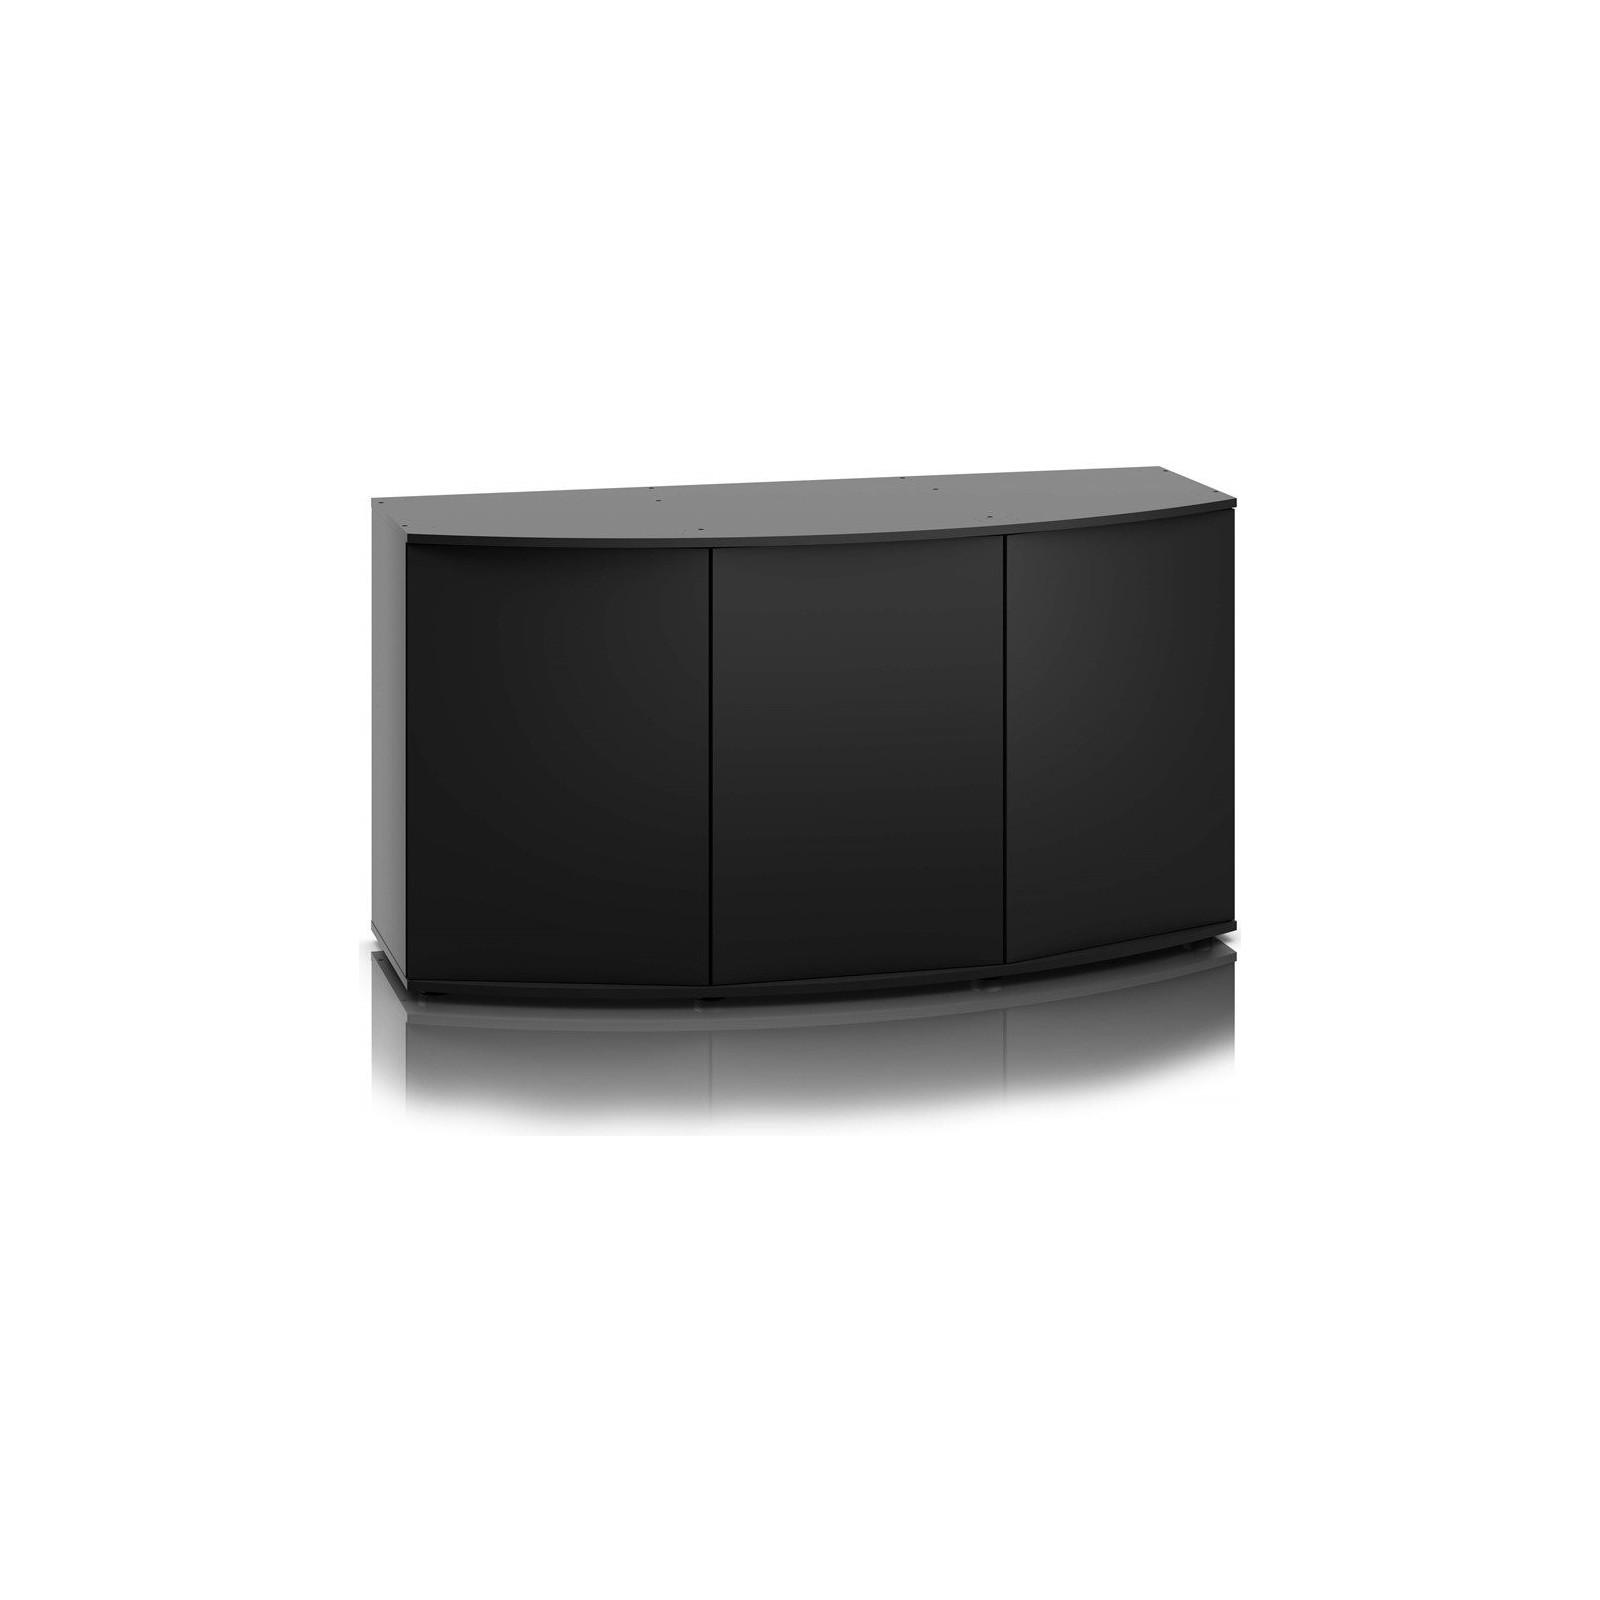 Juwel skříň SBX pro akvárium Vision 450, Barva Černá